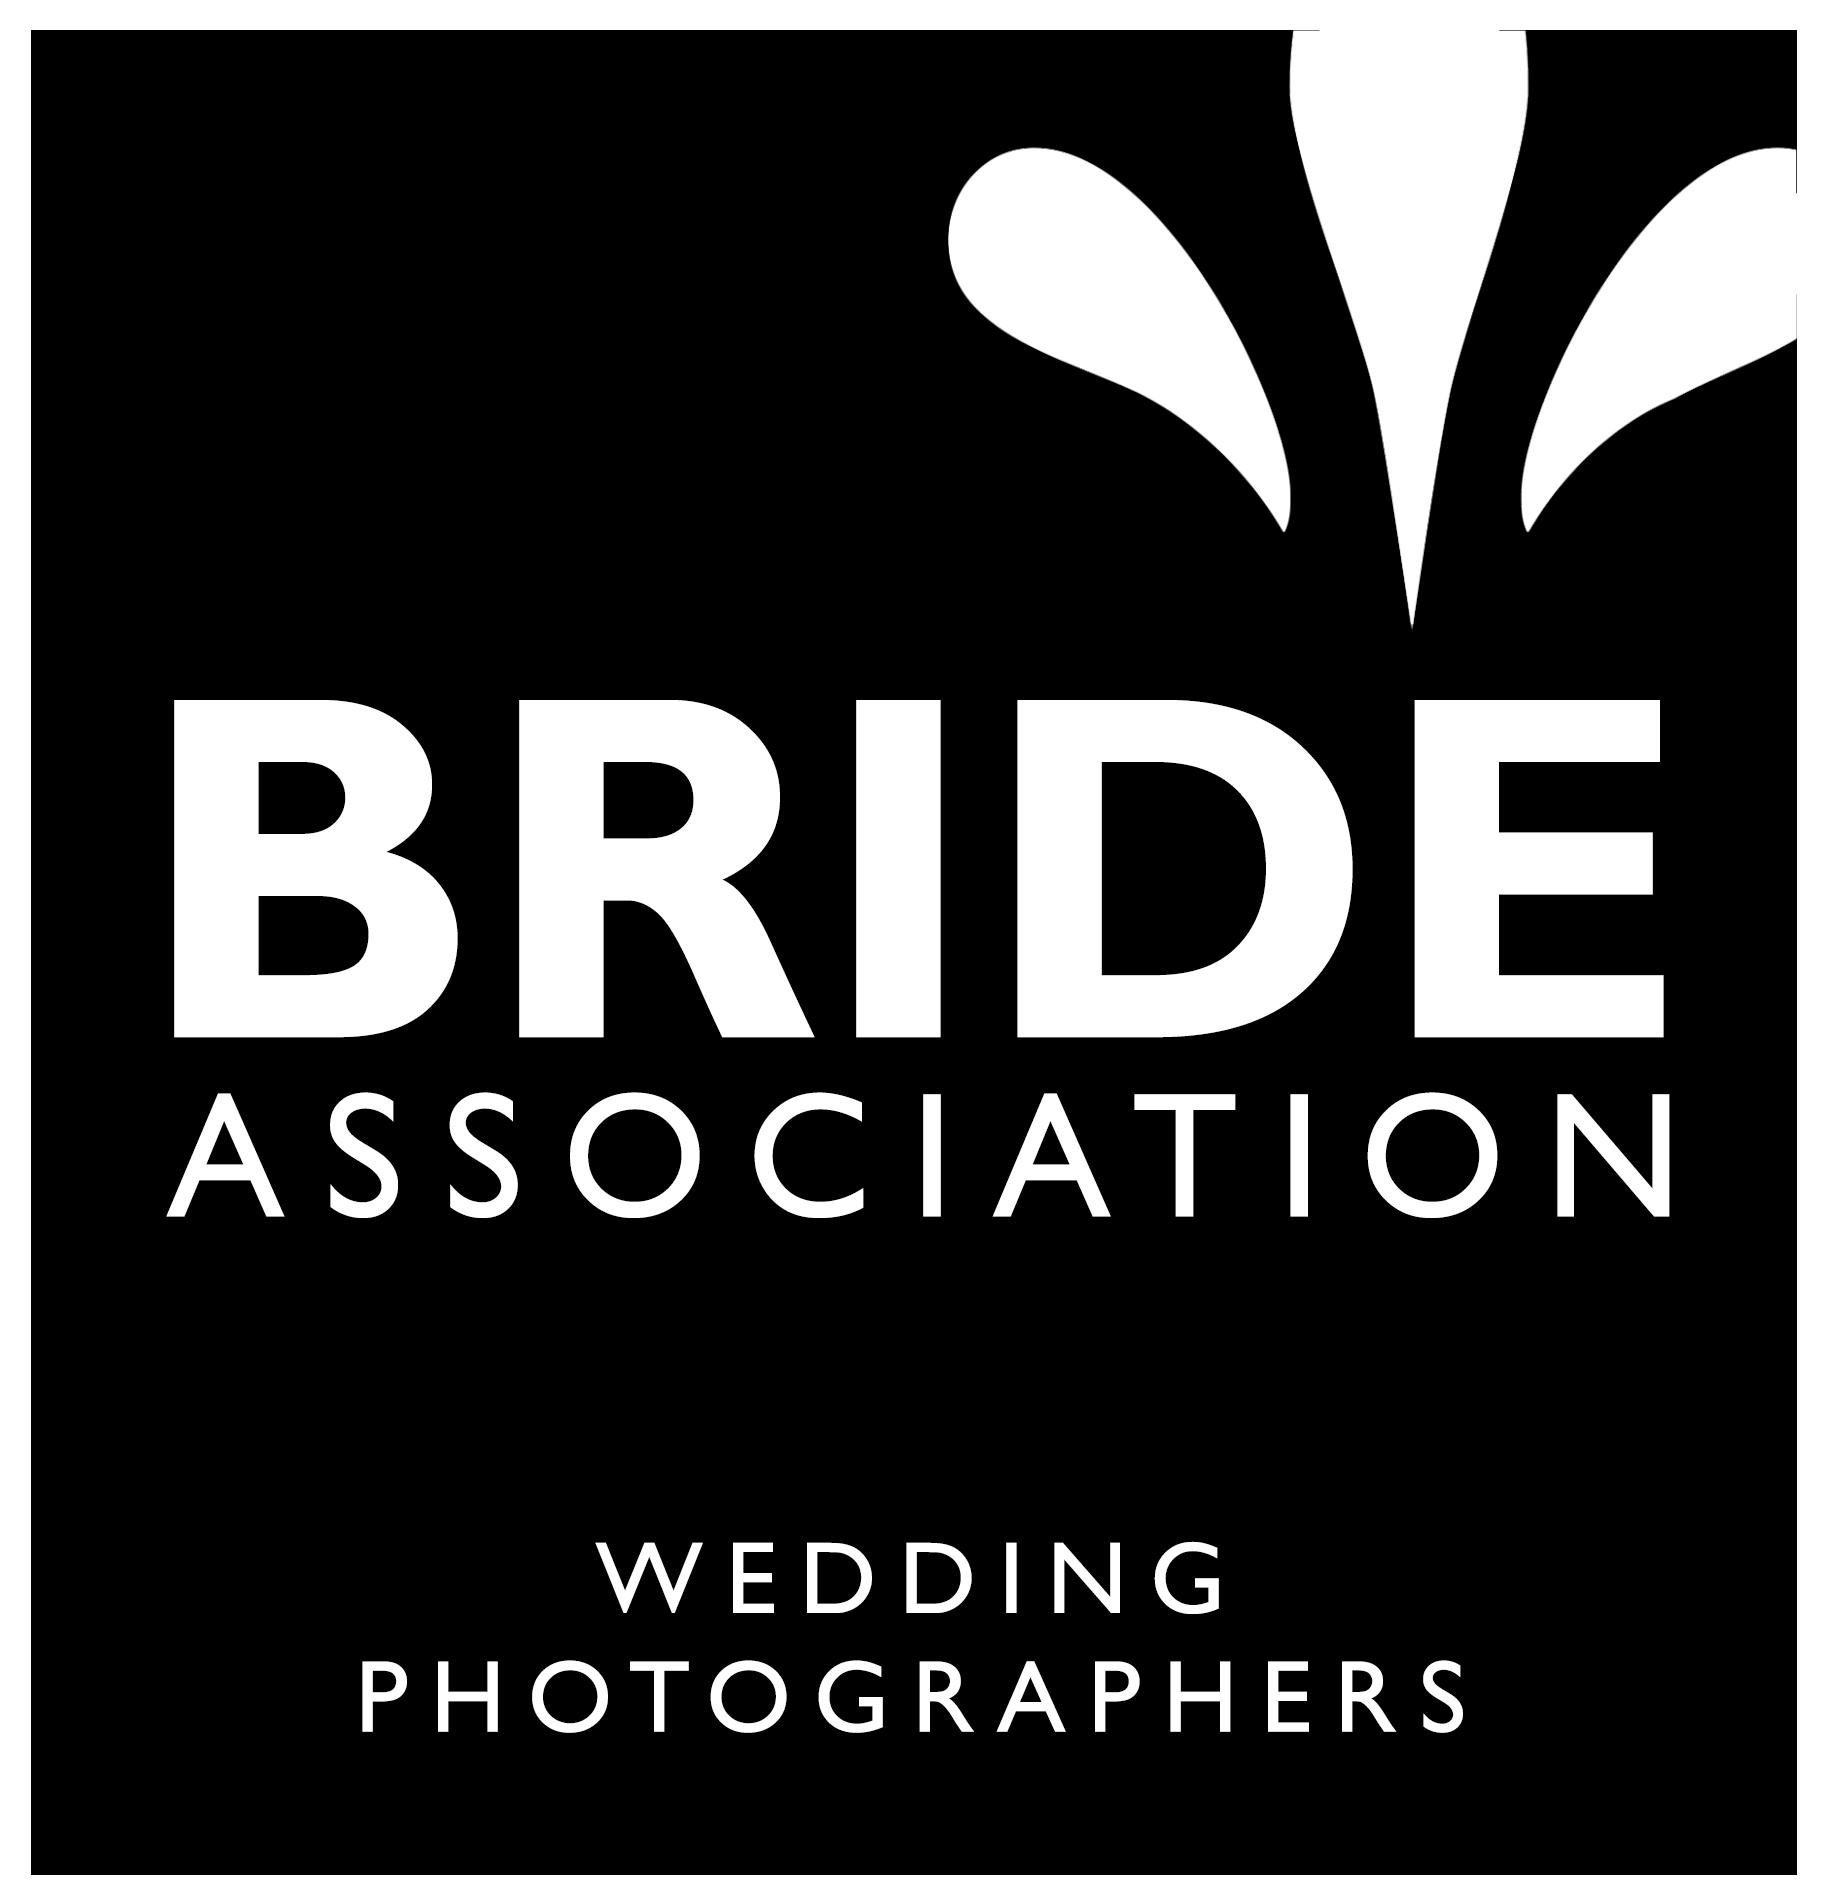 bride association, fotografo de casamento, fotografo premiado, bruno montt, fotografo de casamento rj, fotografo de casamento buzios, fotografo de casamento trancoso, destination wedding